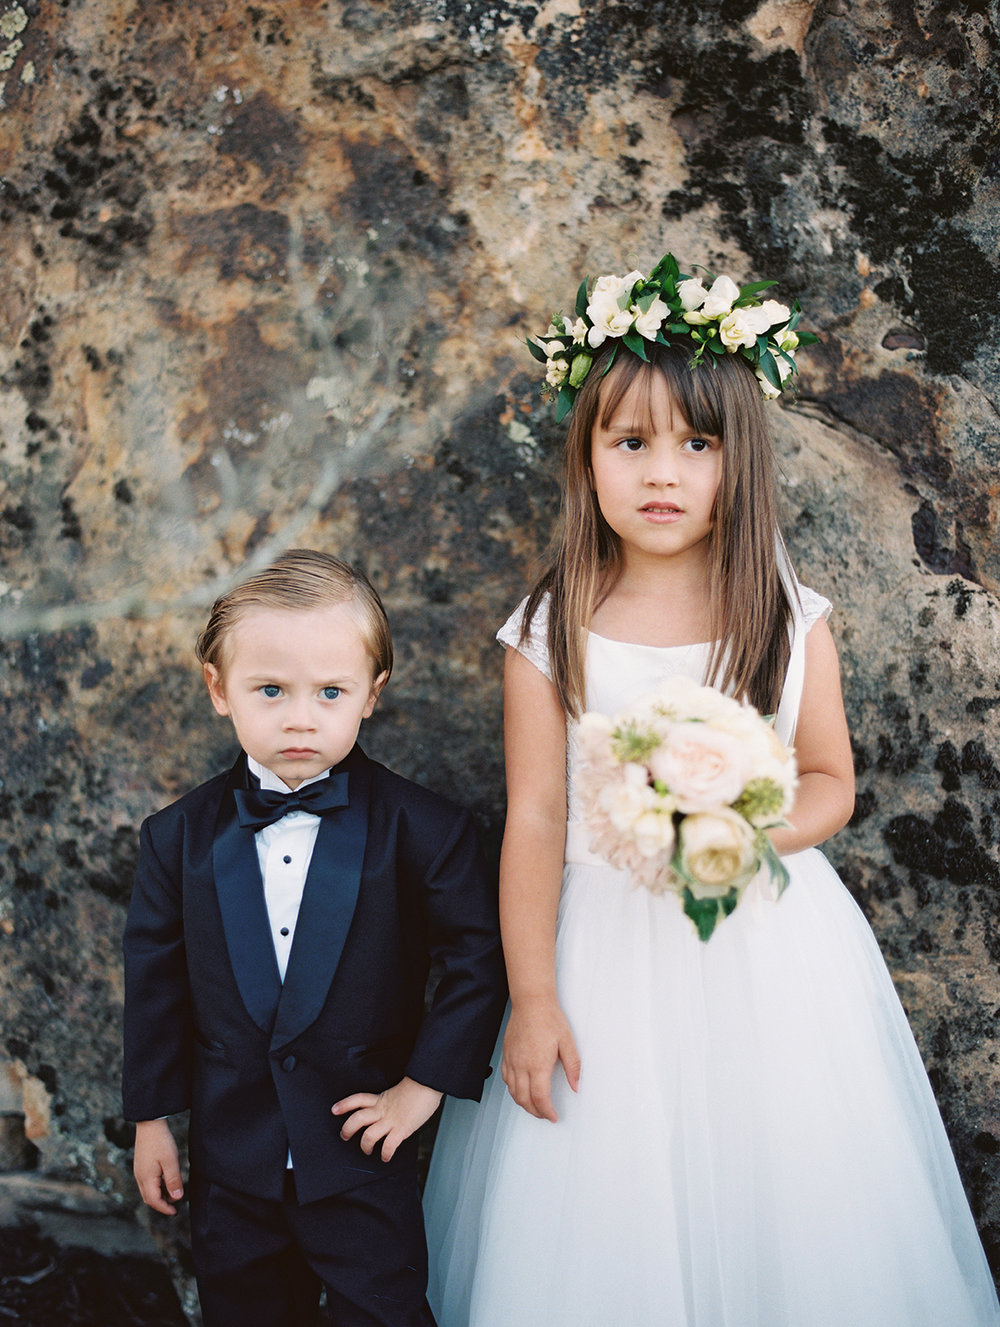 333-brumley-wells-film-photography-destination-wedding-matt-monica.jpg